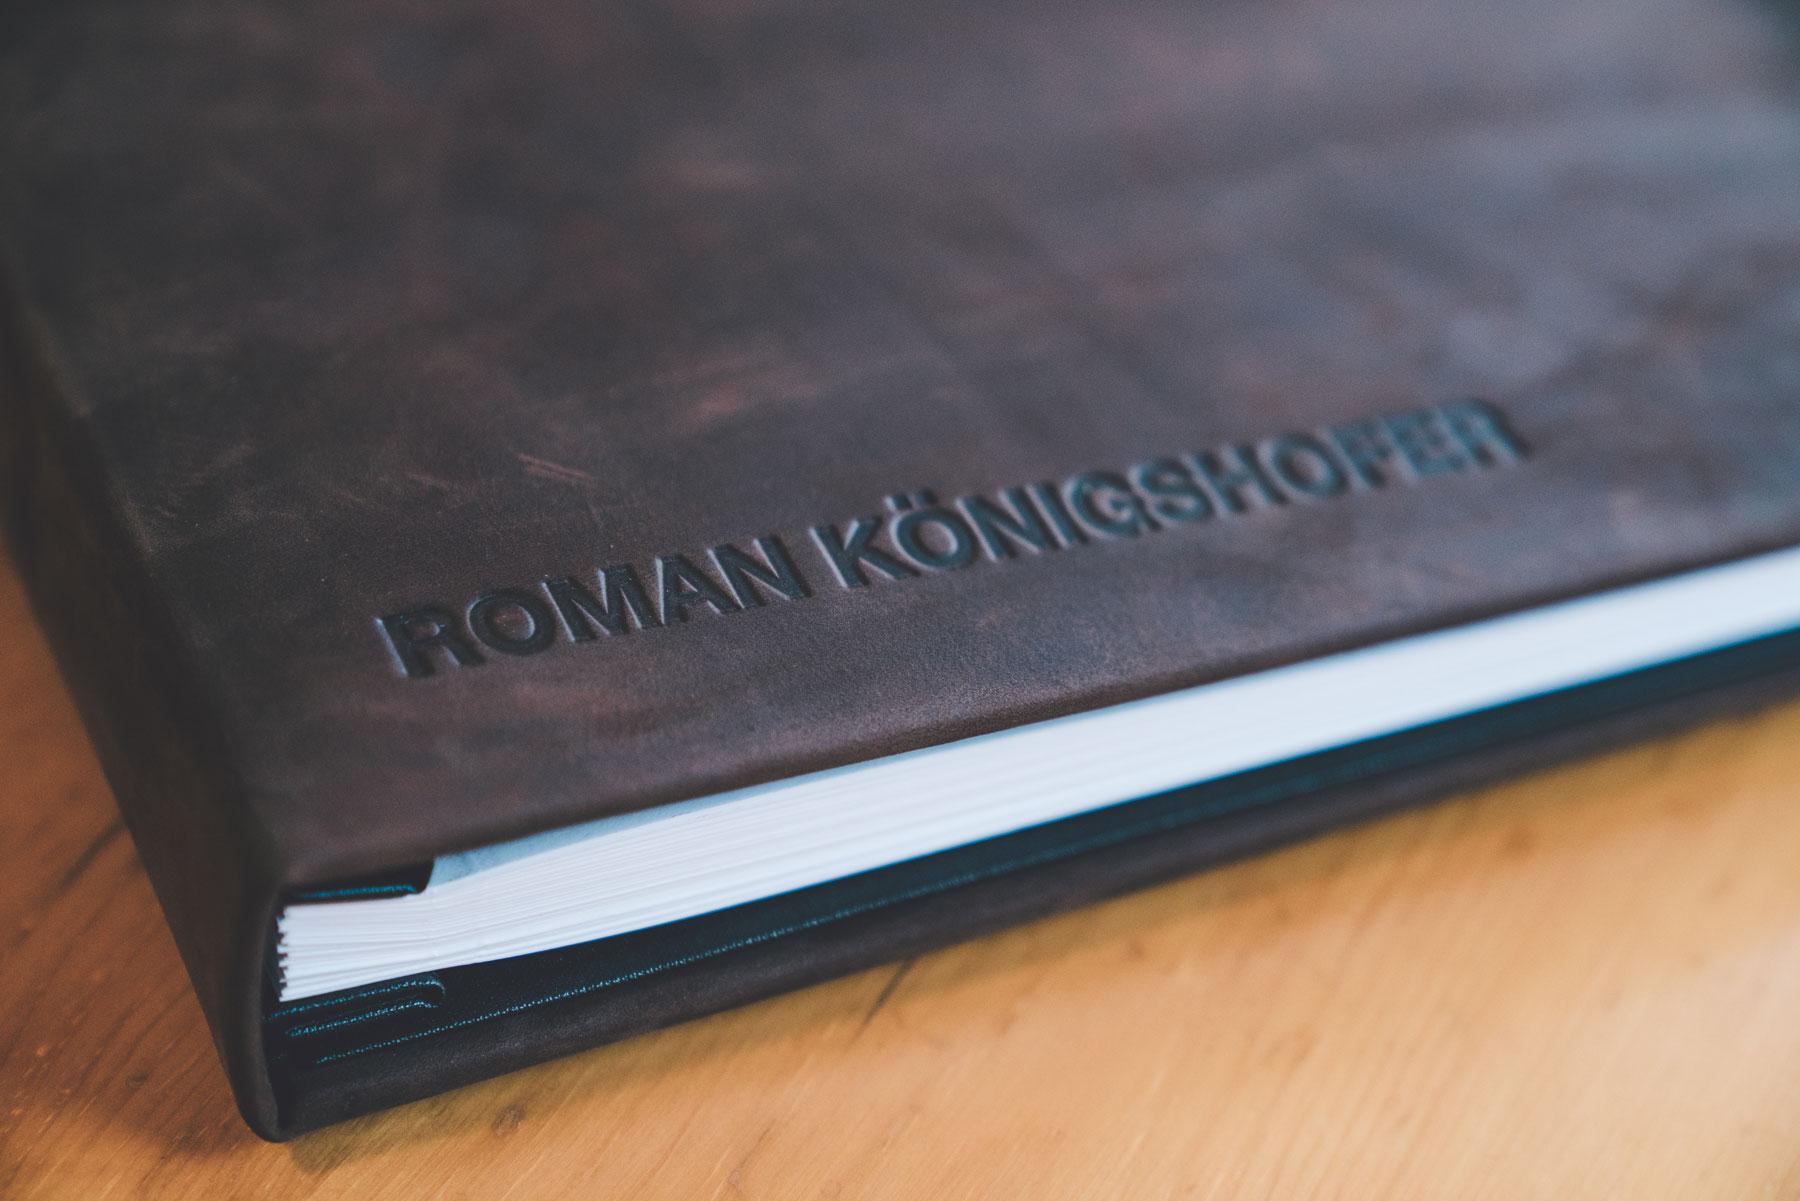 RomanKoenigshofer_Represented_by_KME_Studios_Print_Portfolio_DSC04796